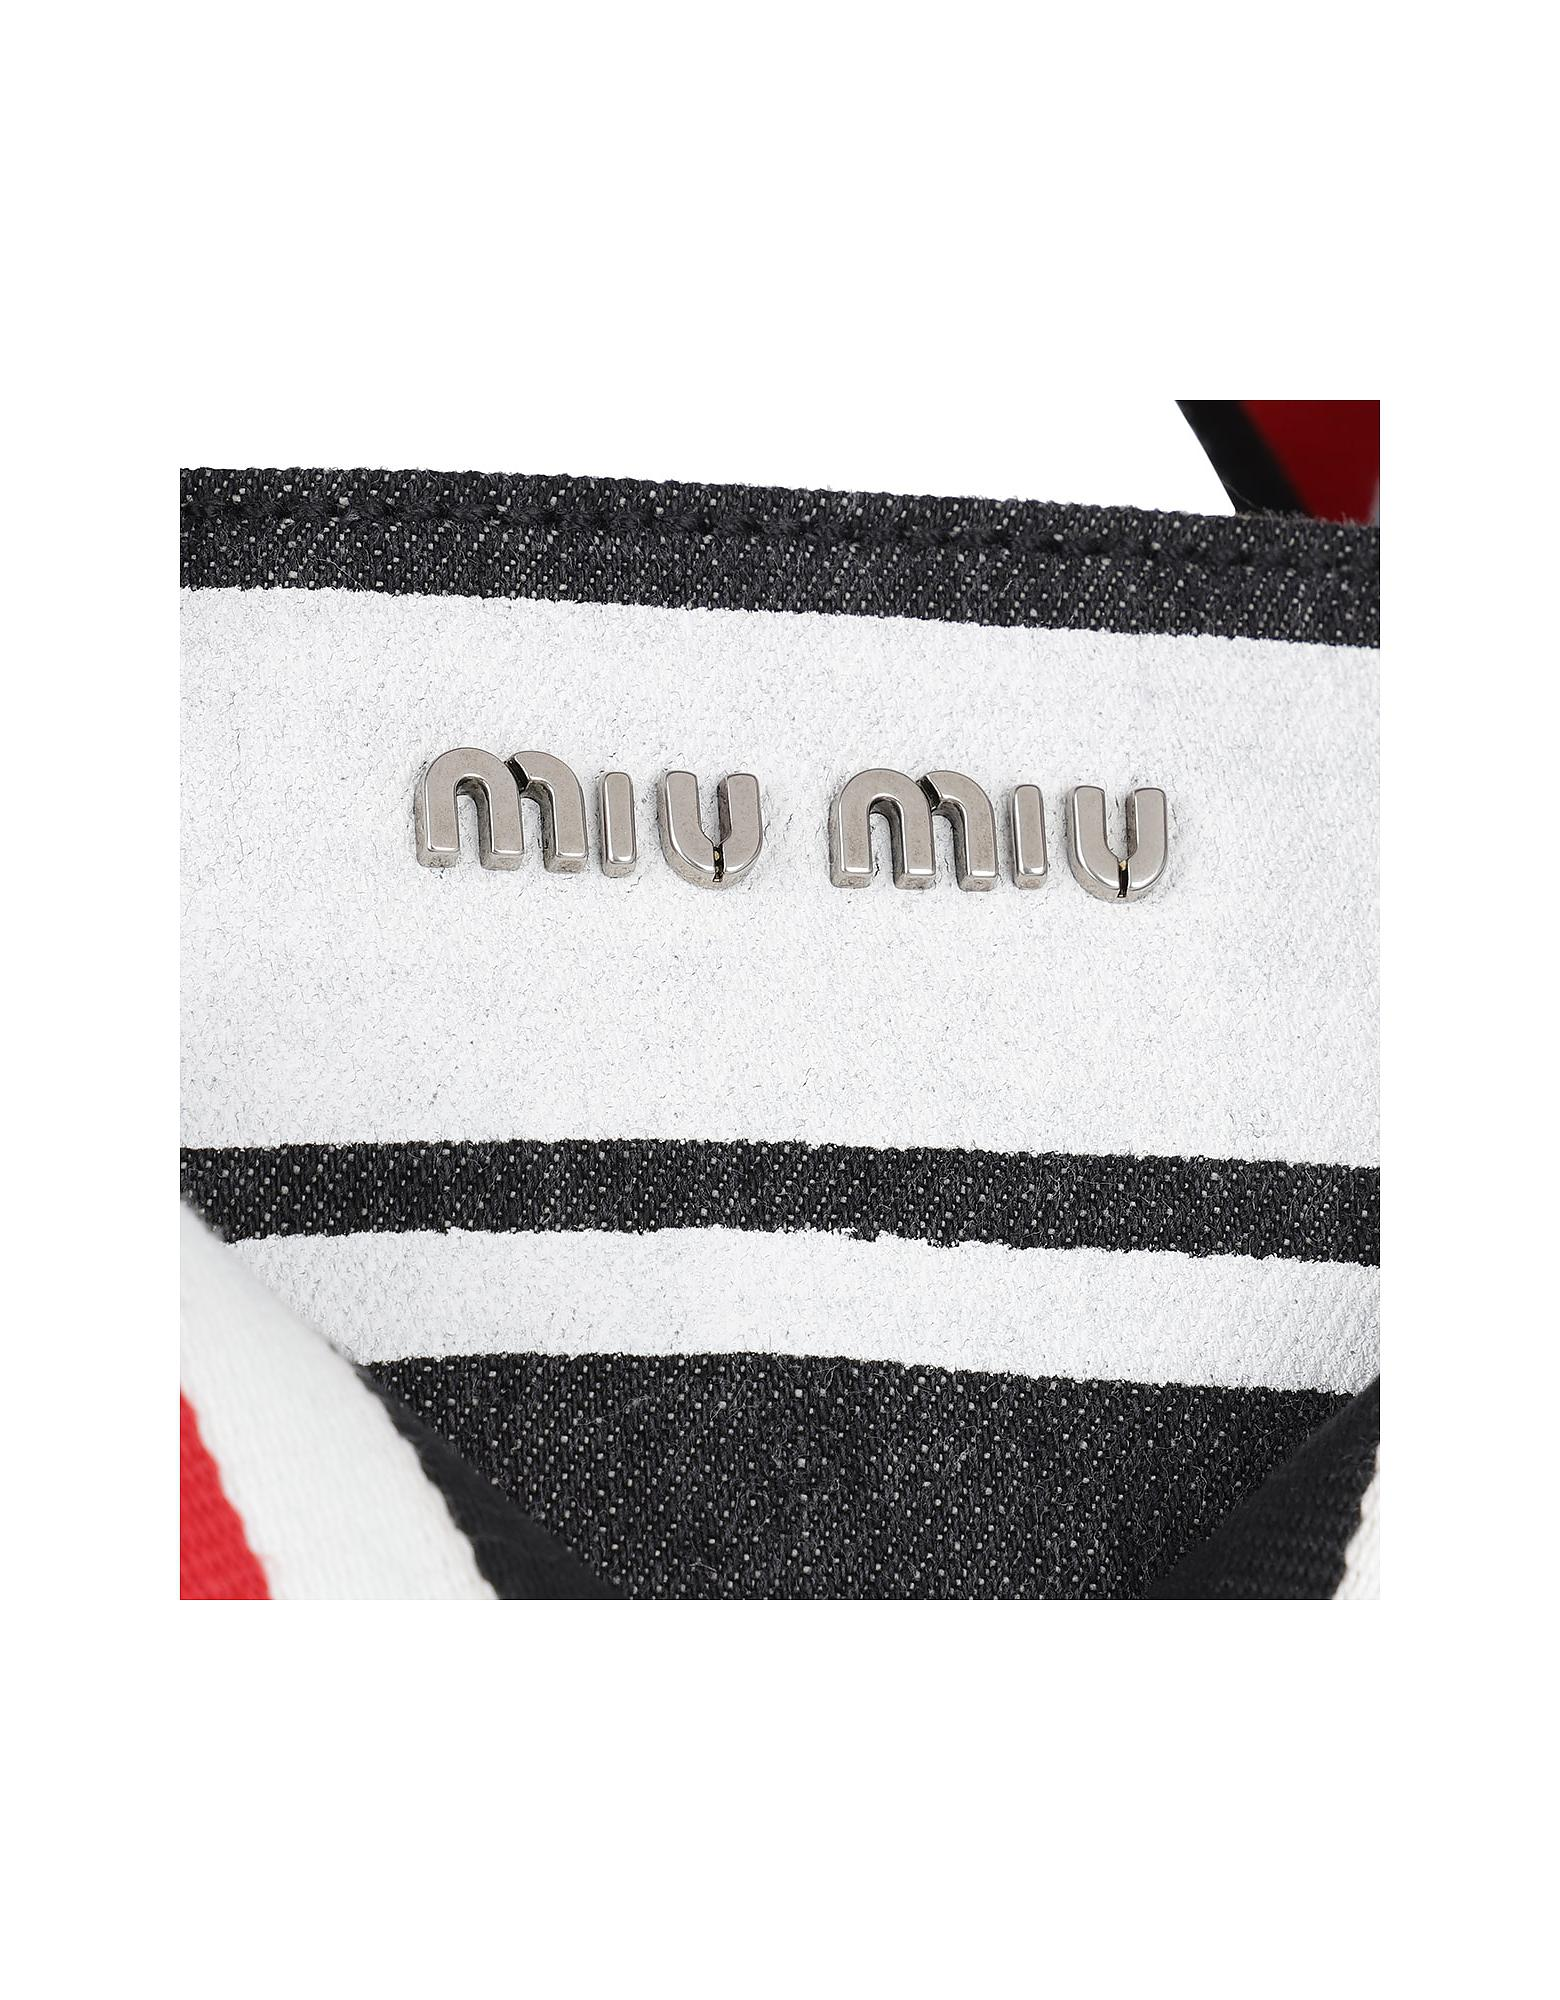 Lyst - Miu Miu Denim Logo Shopping Bag Nero bianco in Gray 74578f848b4e8